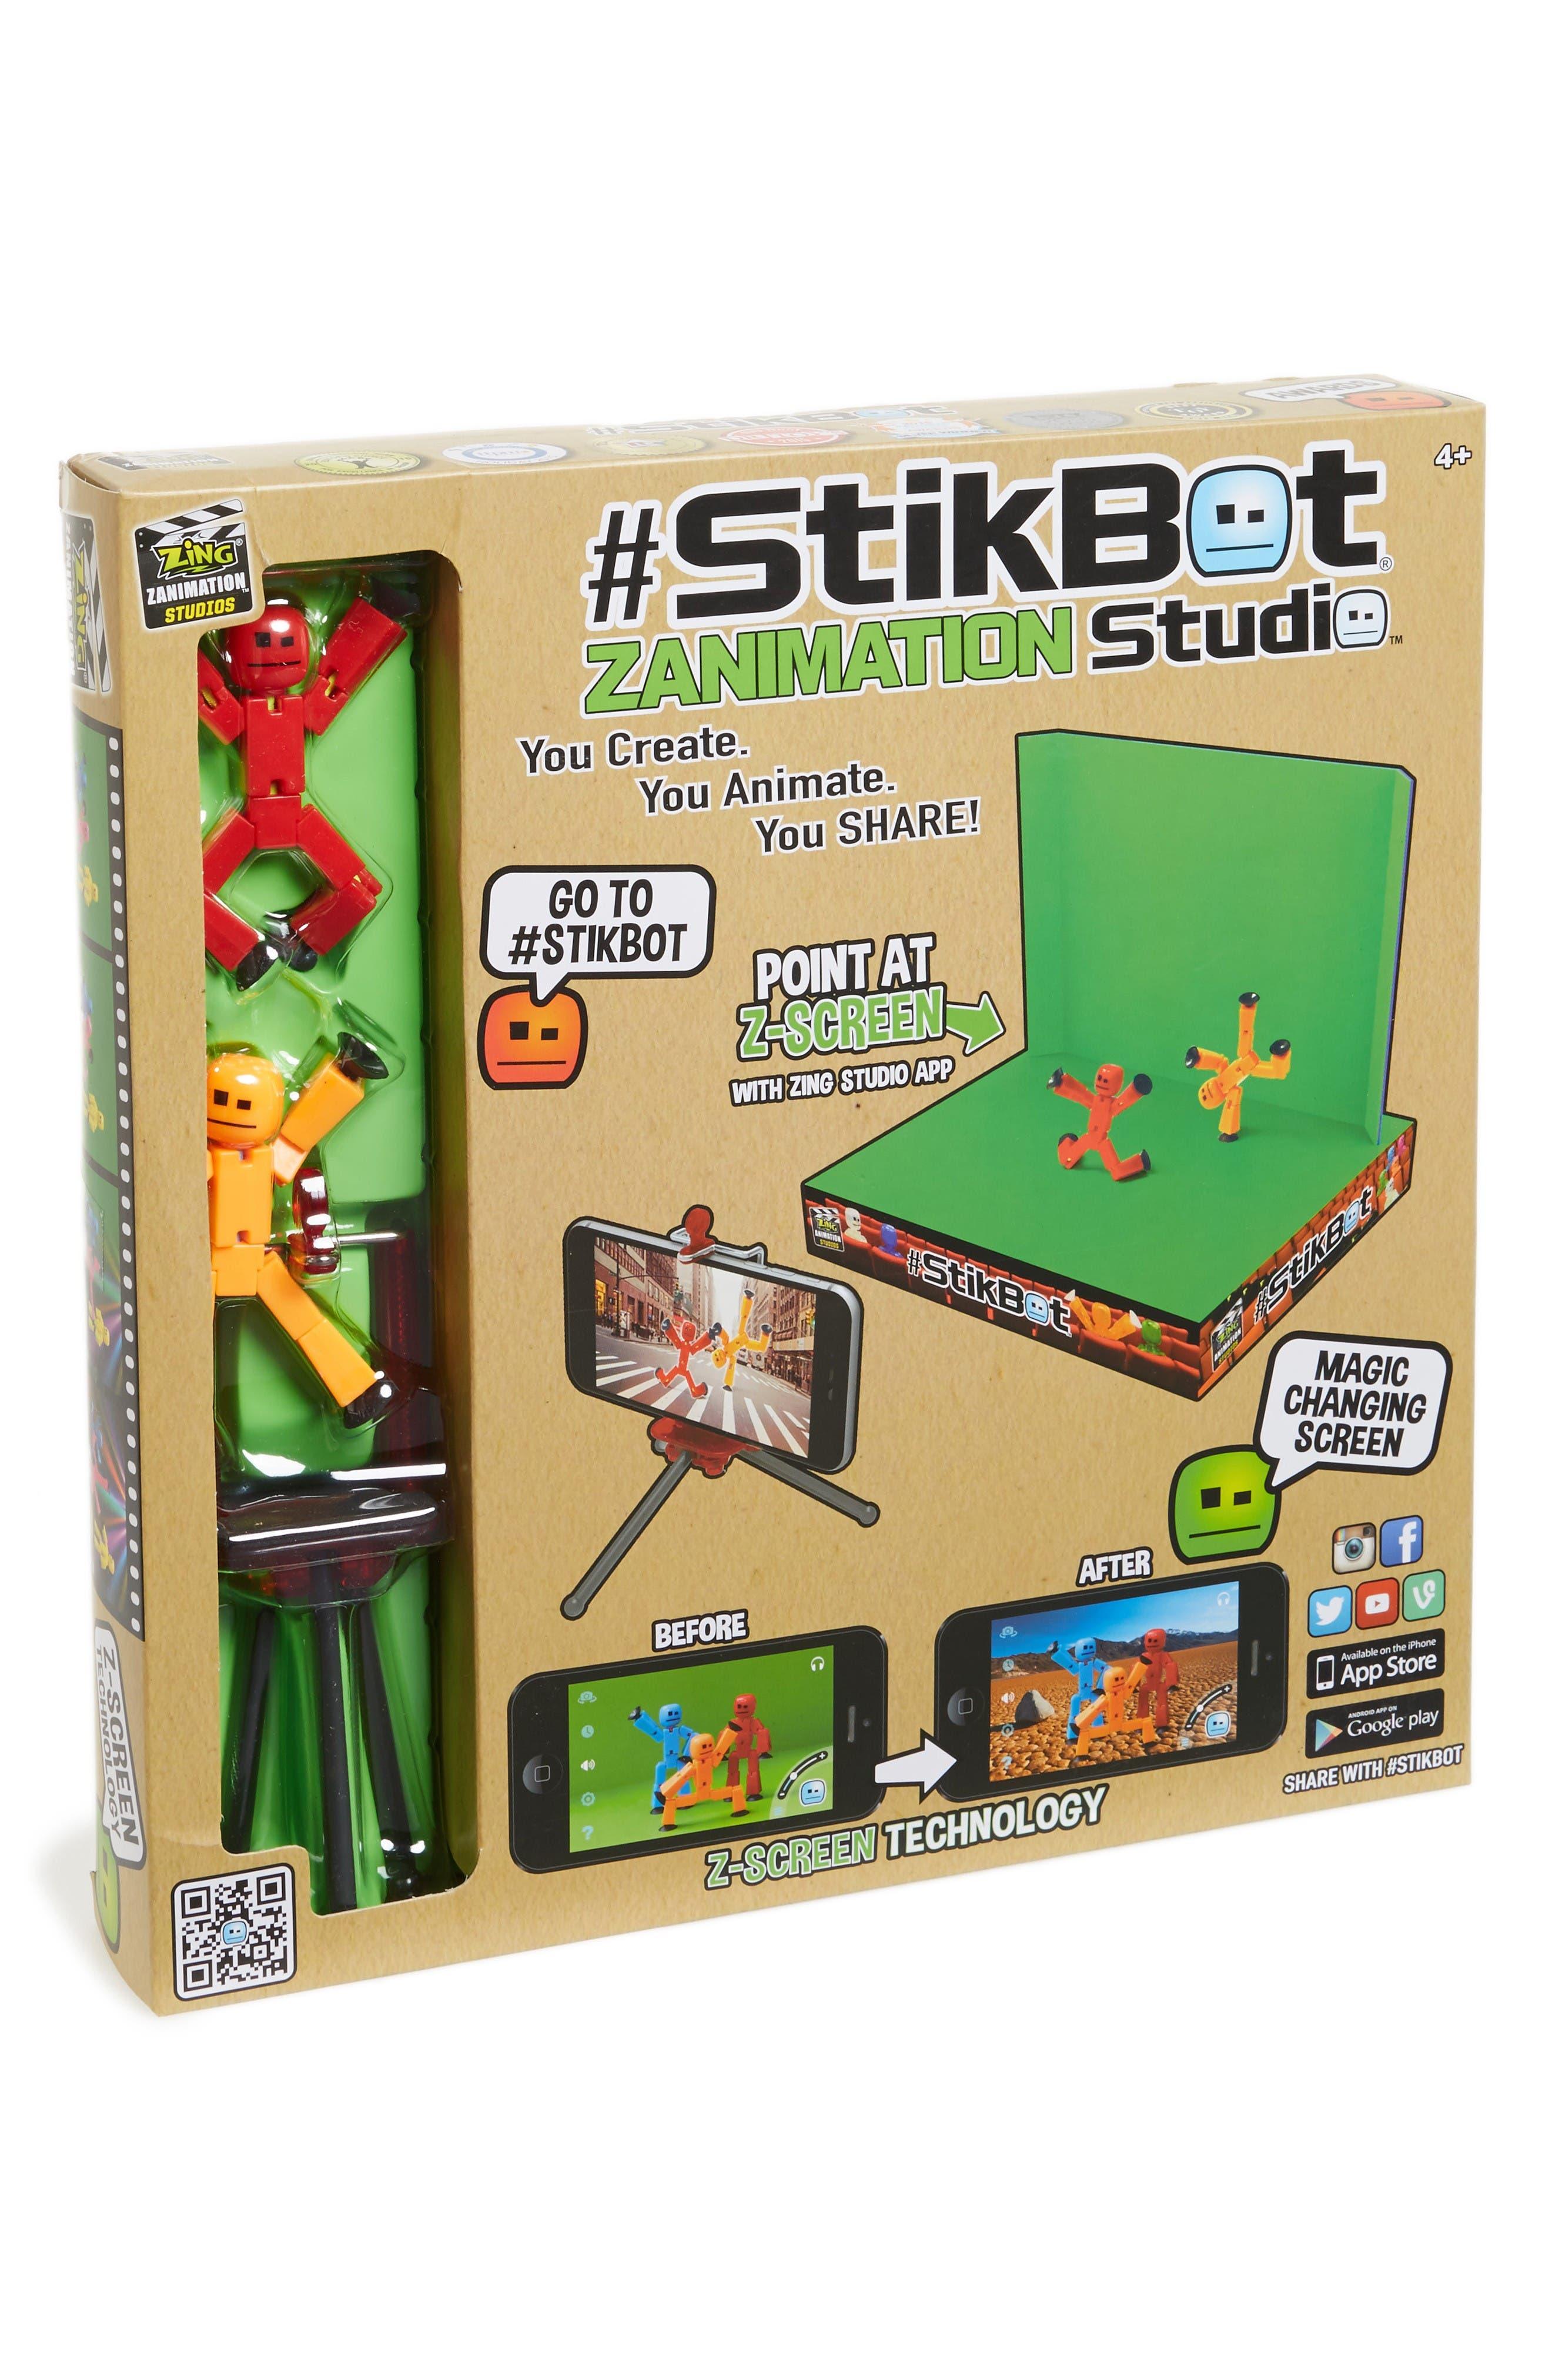 Zing StikBot Pro Zanimation Studio